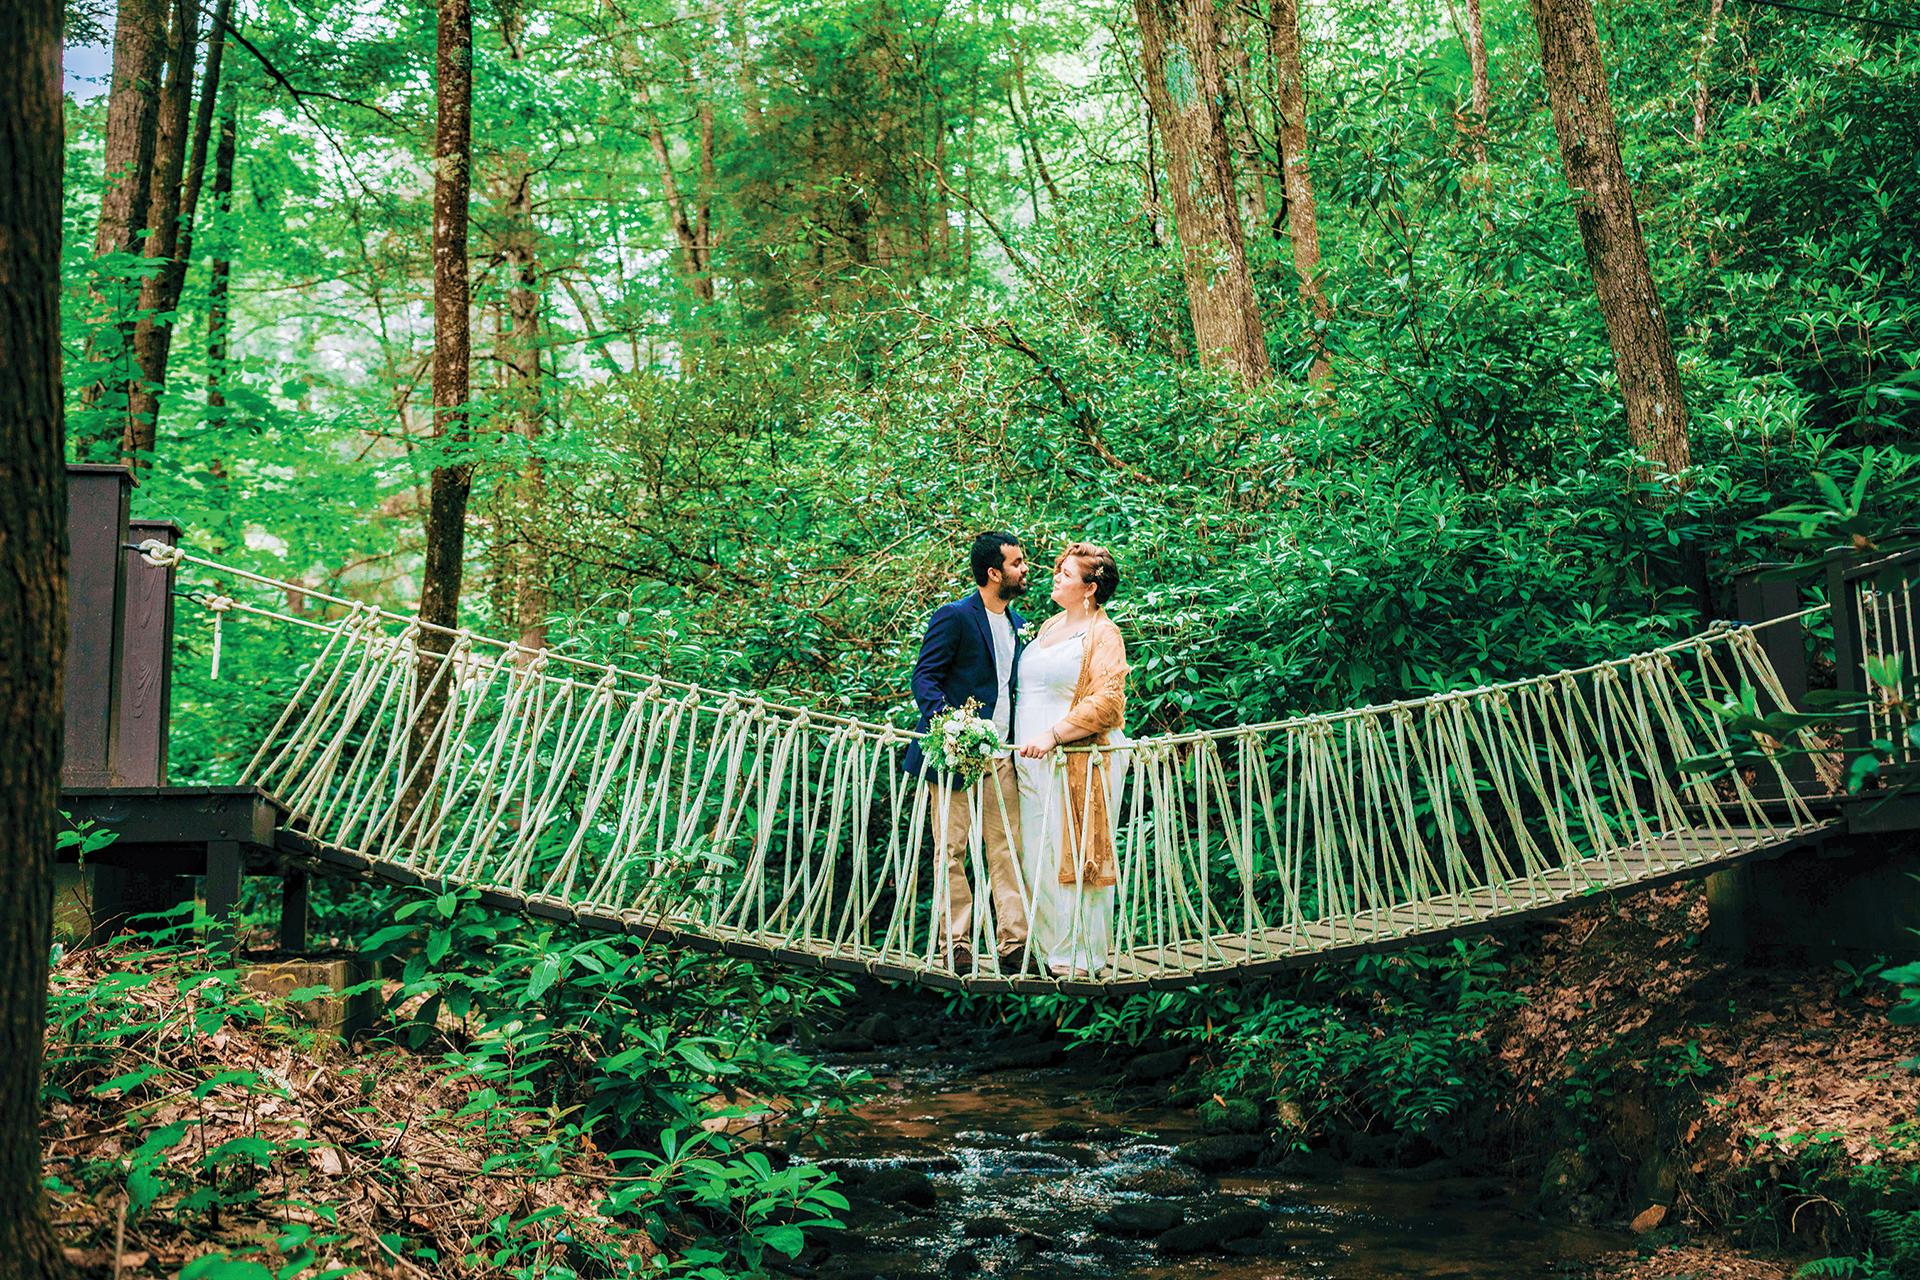 secret-waters-wedding-bridge-couple